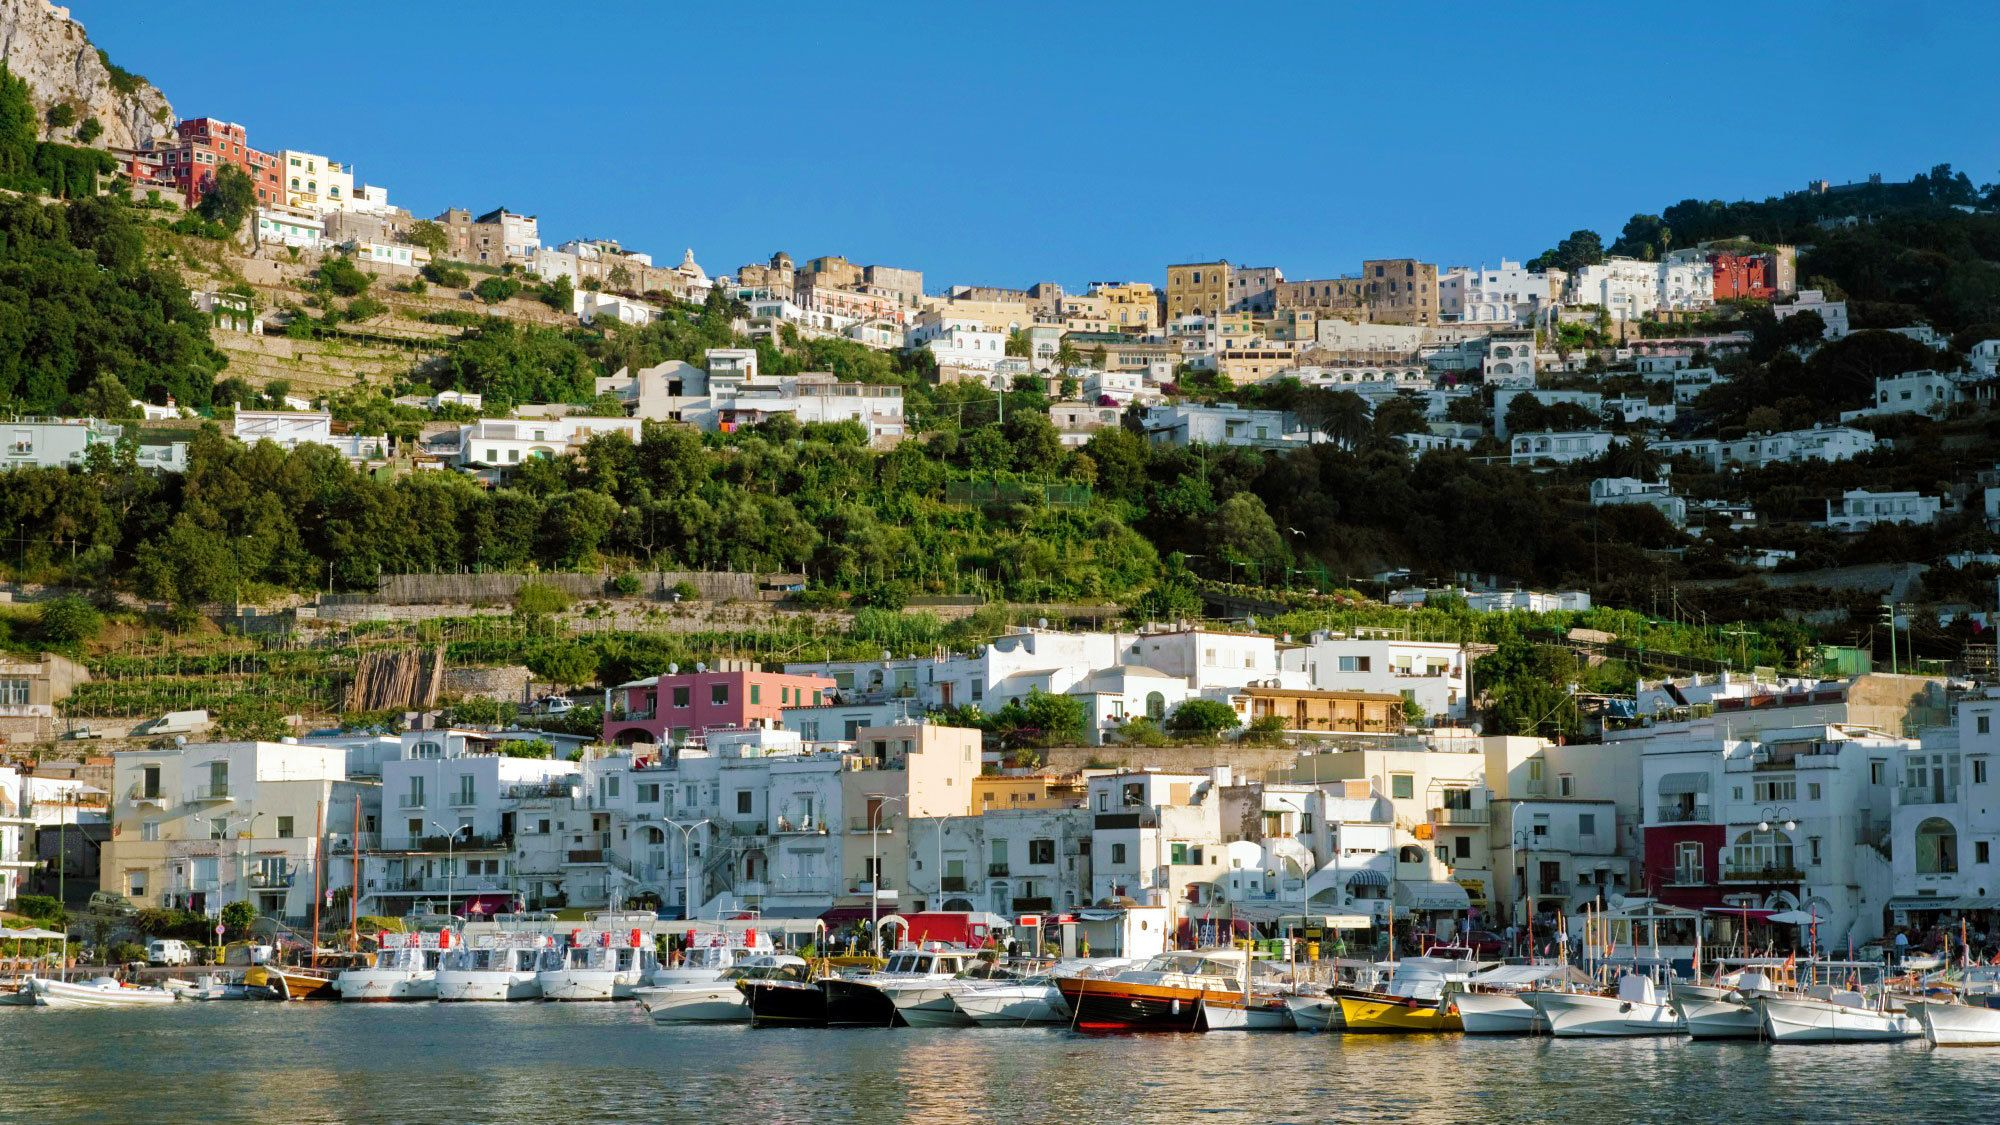 Tagesausflug nach Capri von Neapel